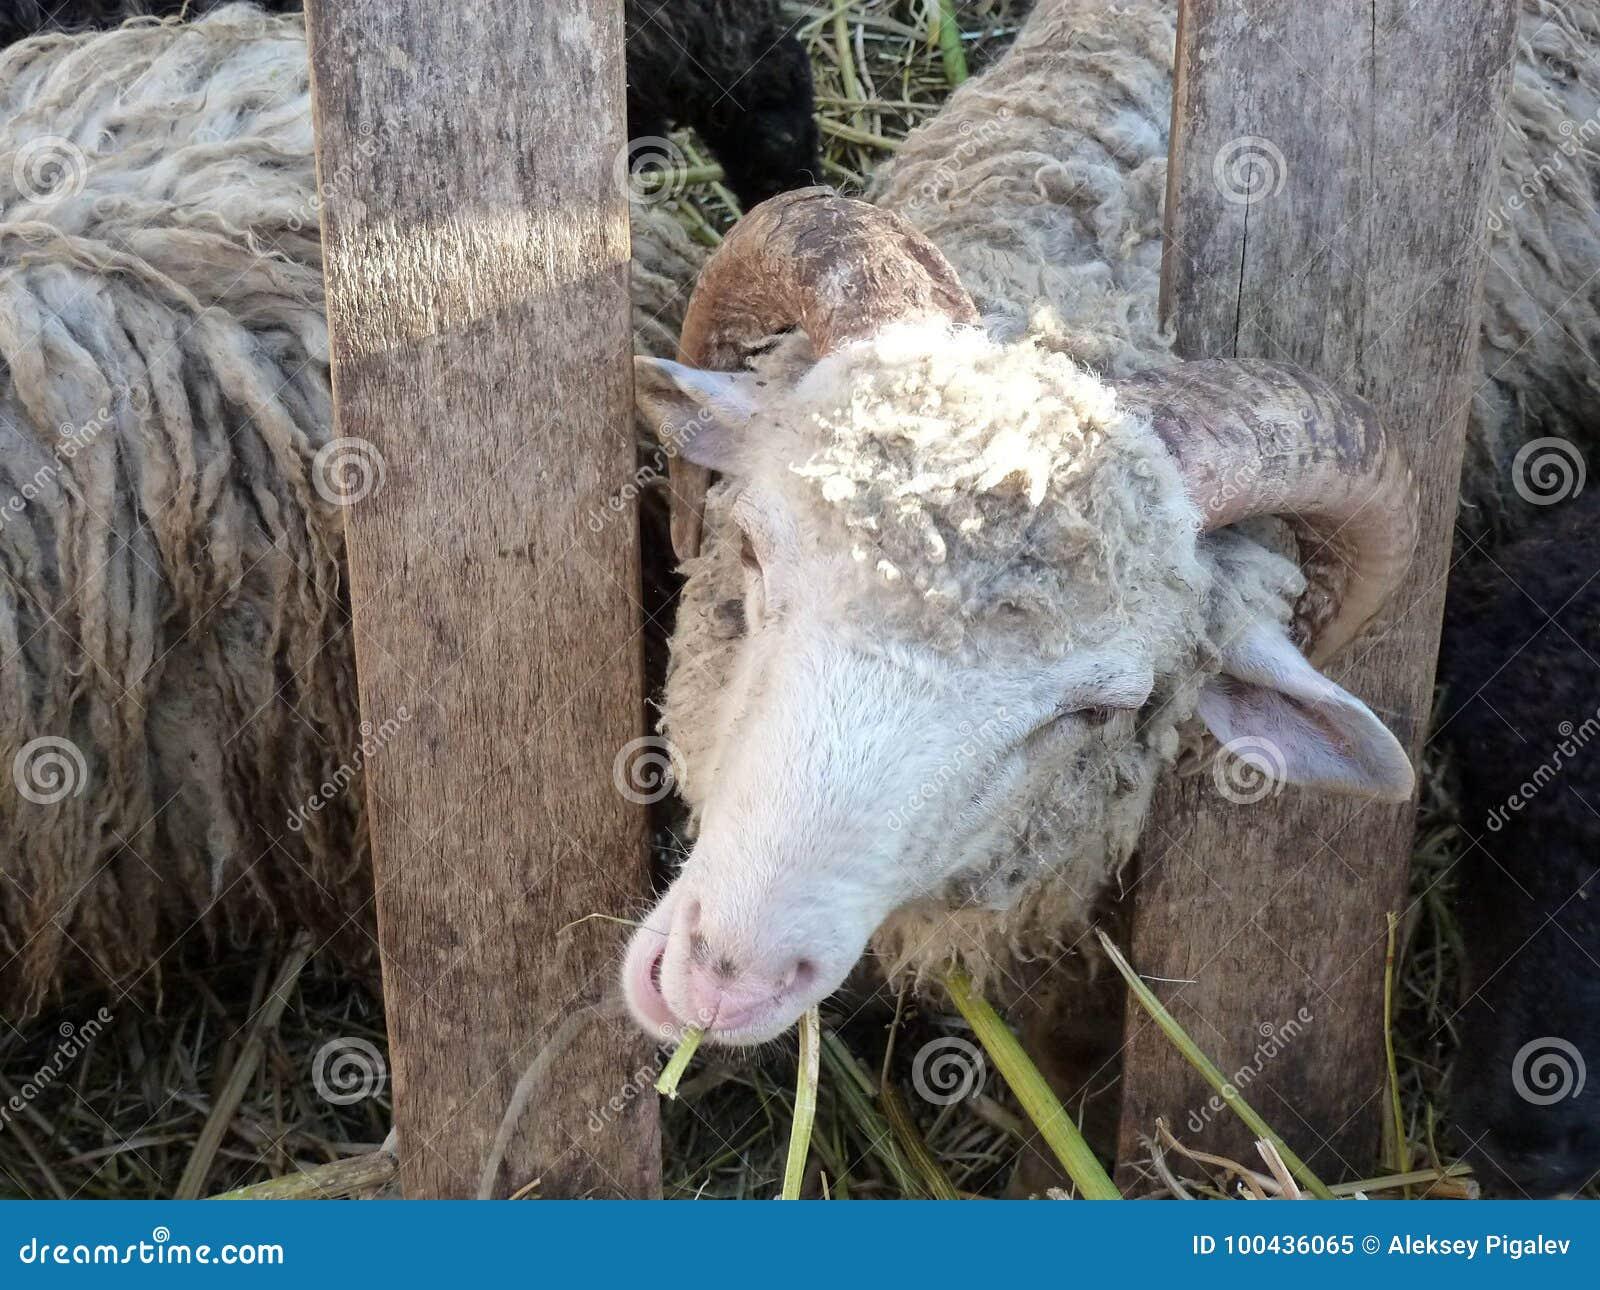 Sheep, melancholic chewing grass